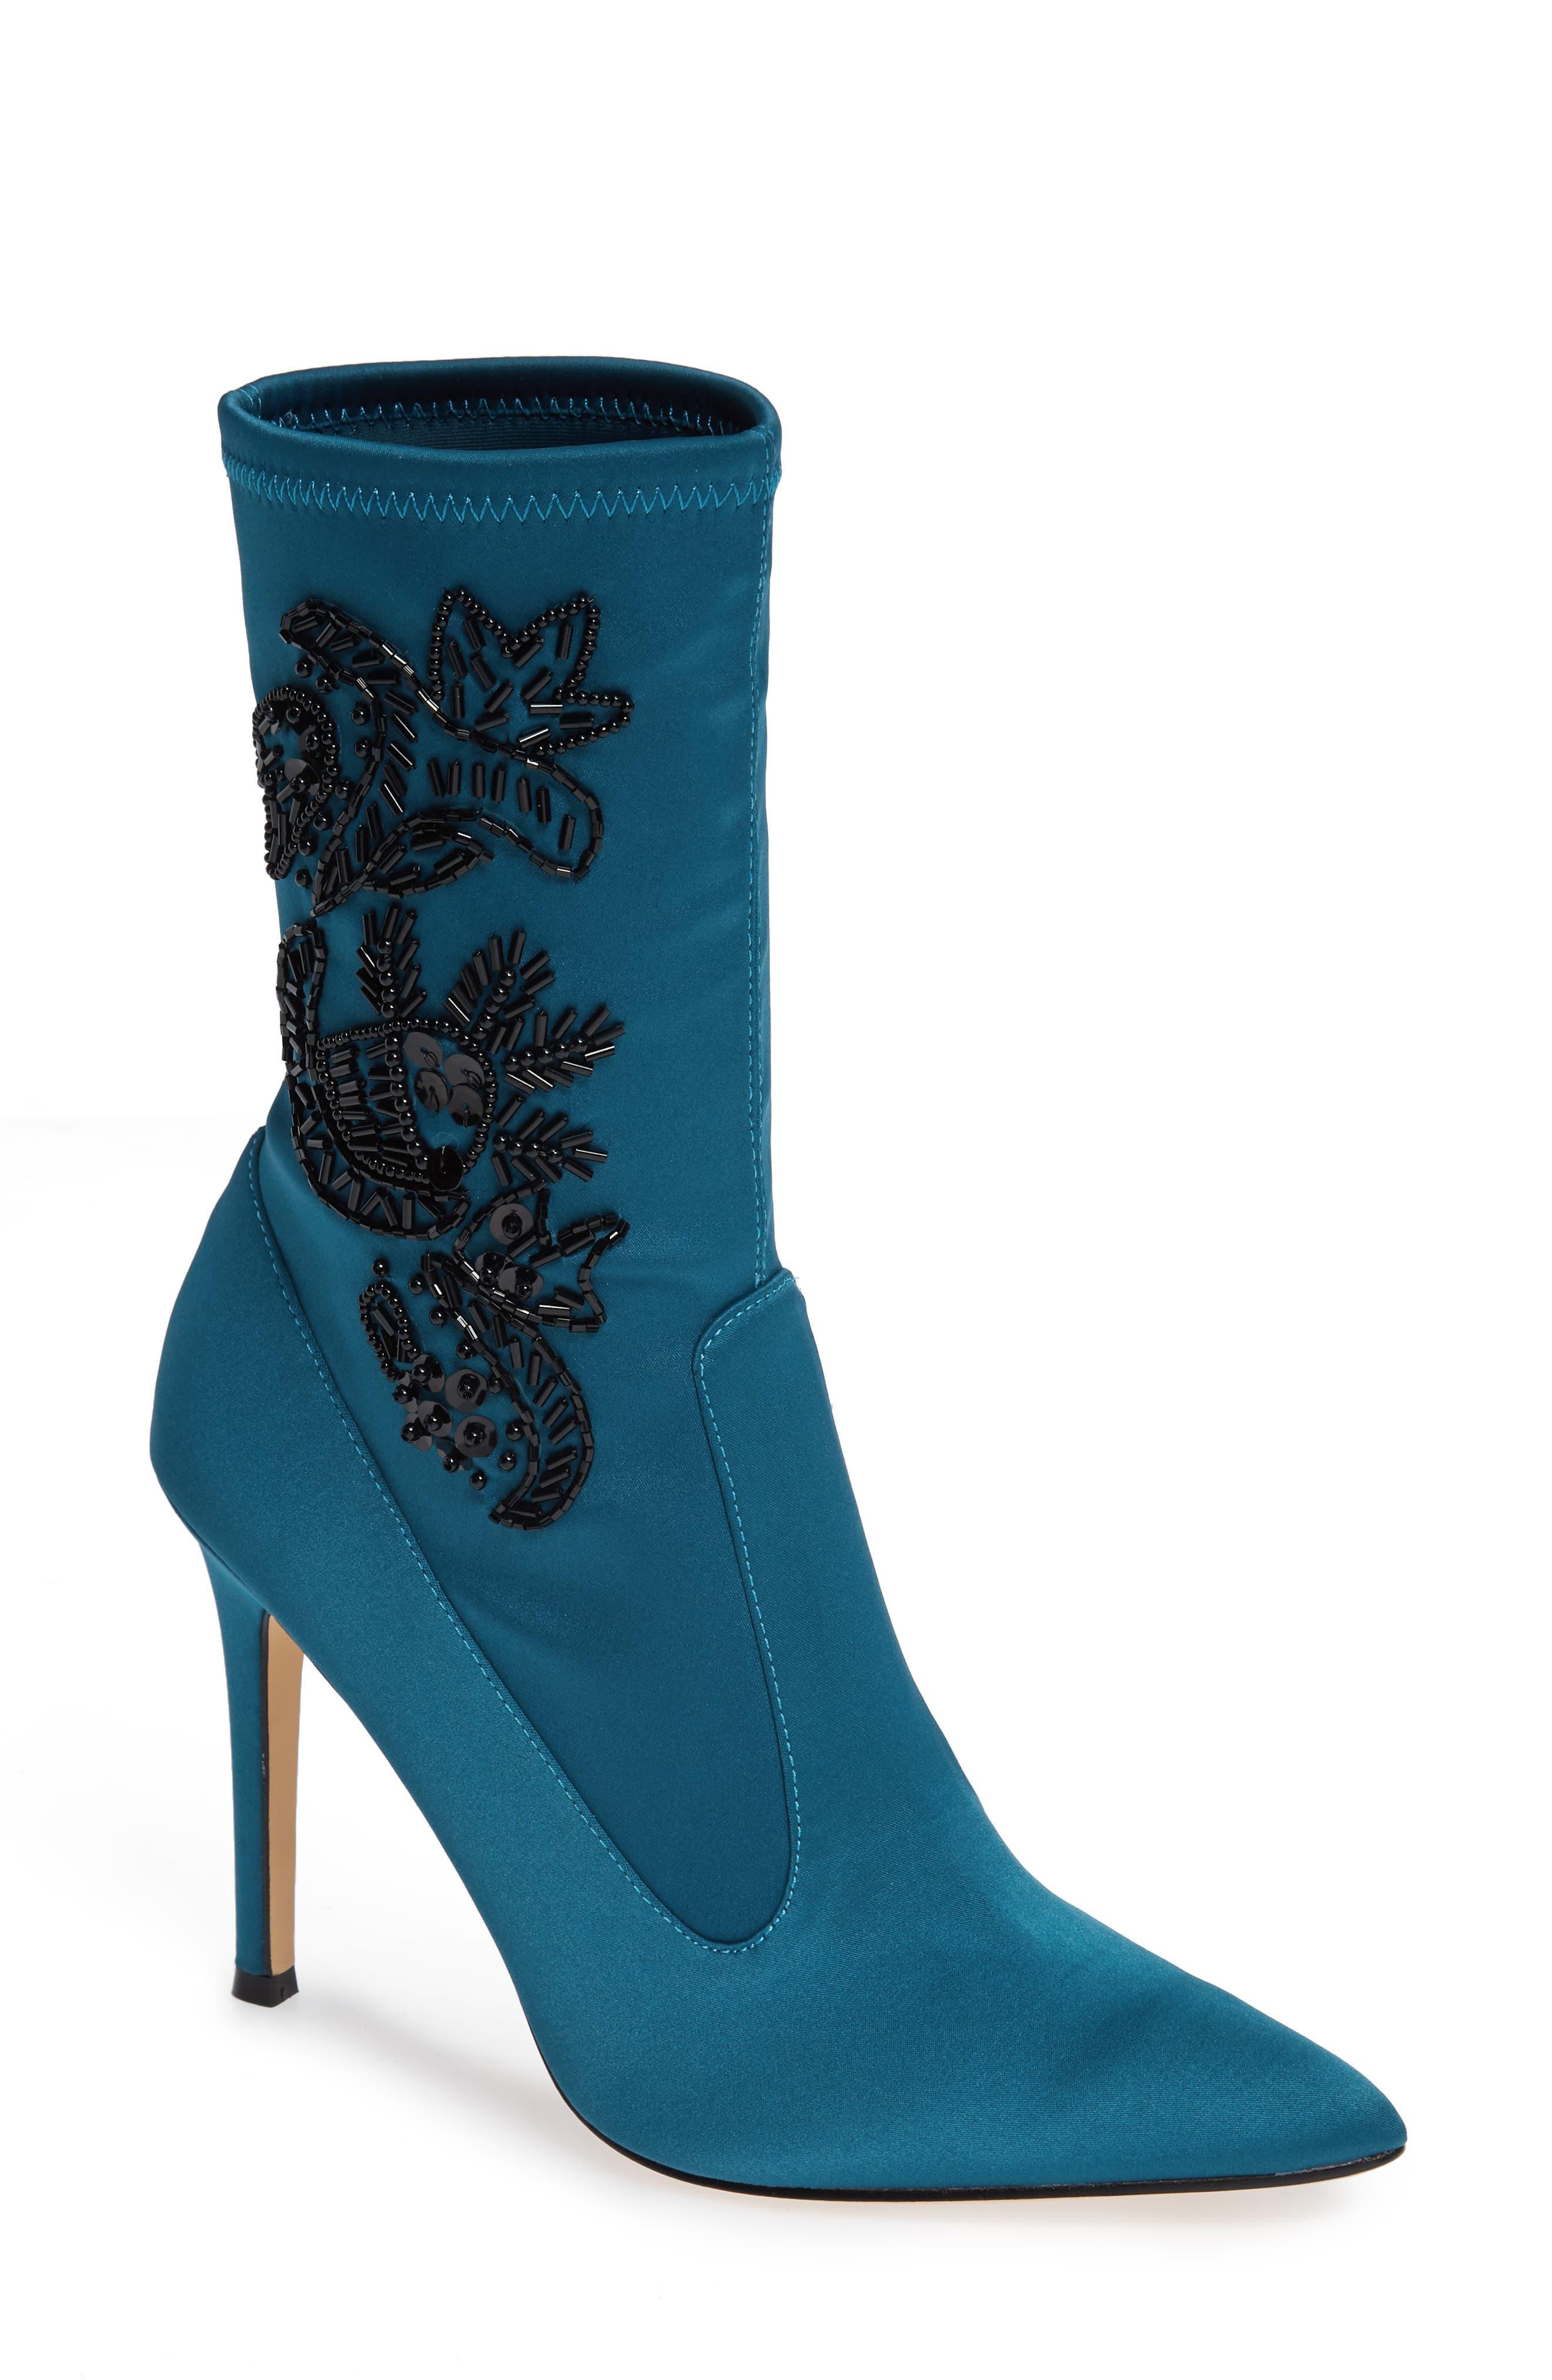 Nina Dorella Pointy Toe Bootie, Blue/green